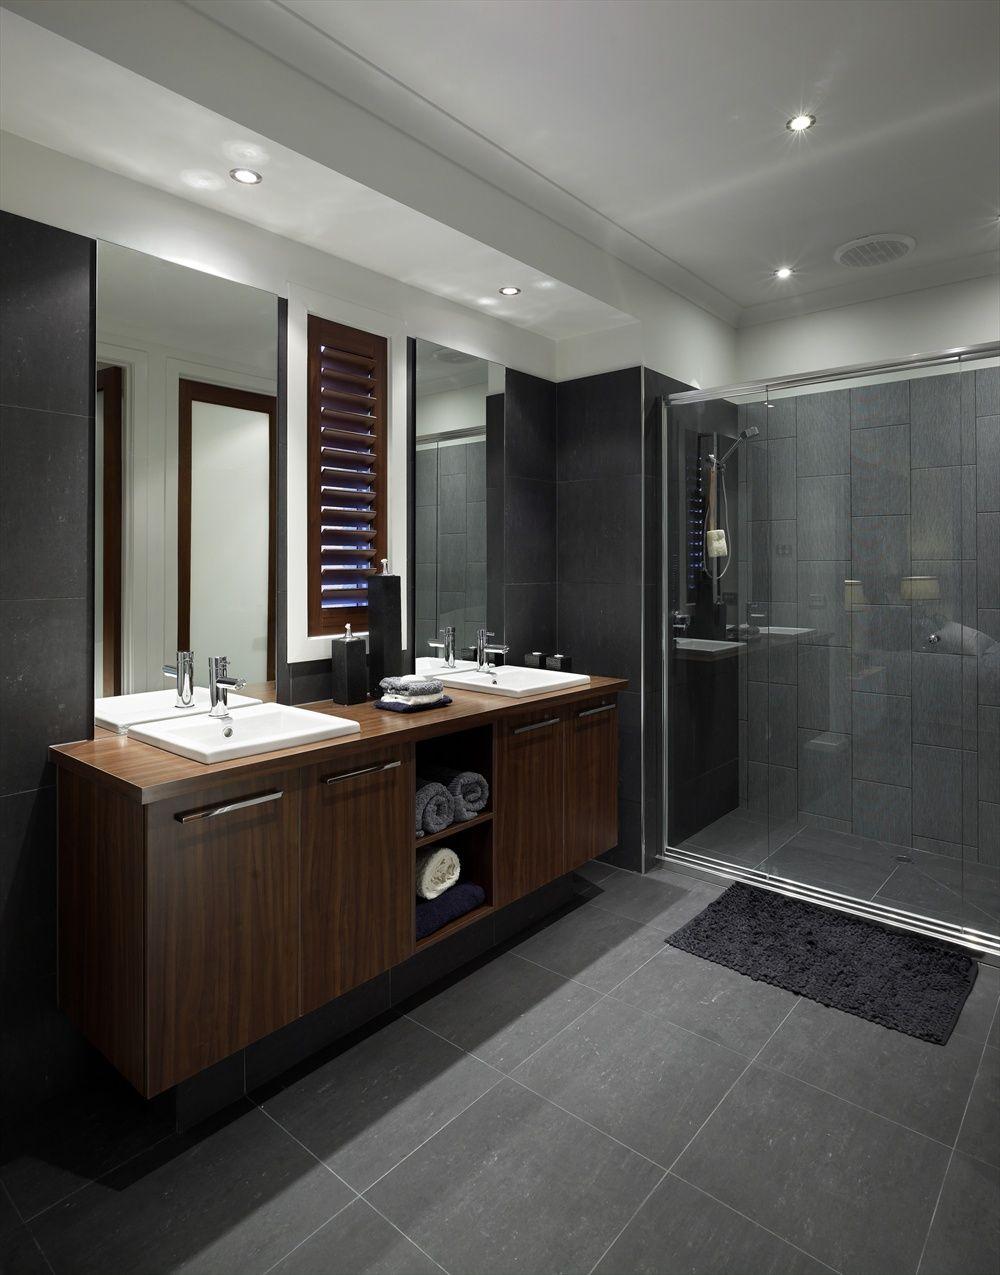 Room idea | Bathroom interior design, Modern bathroom ...